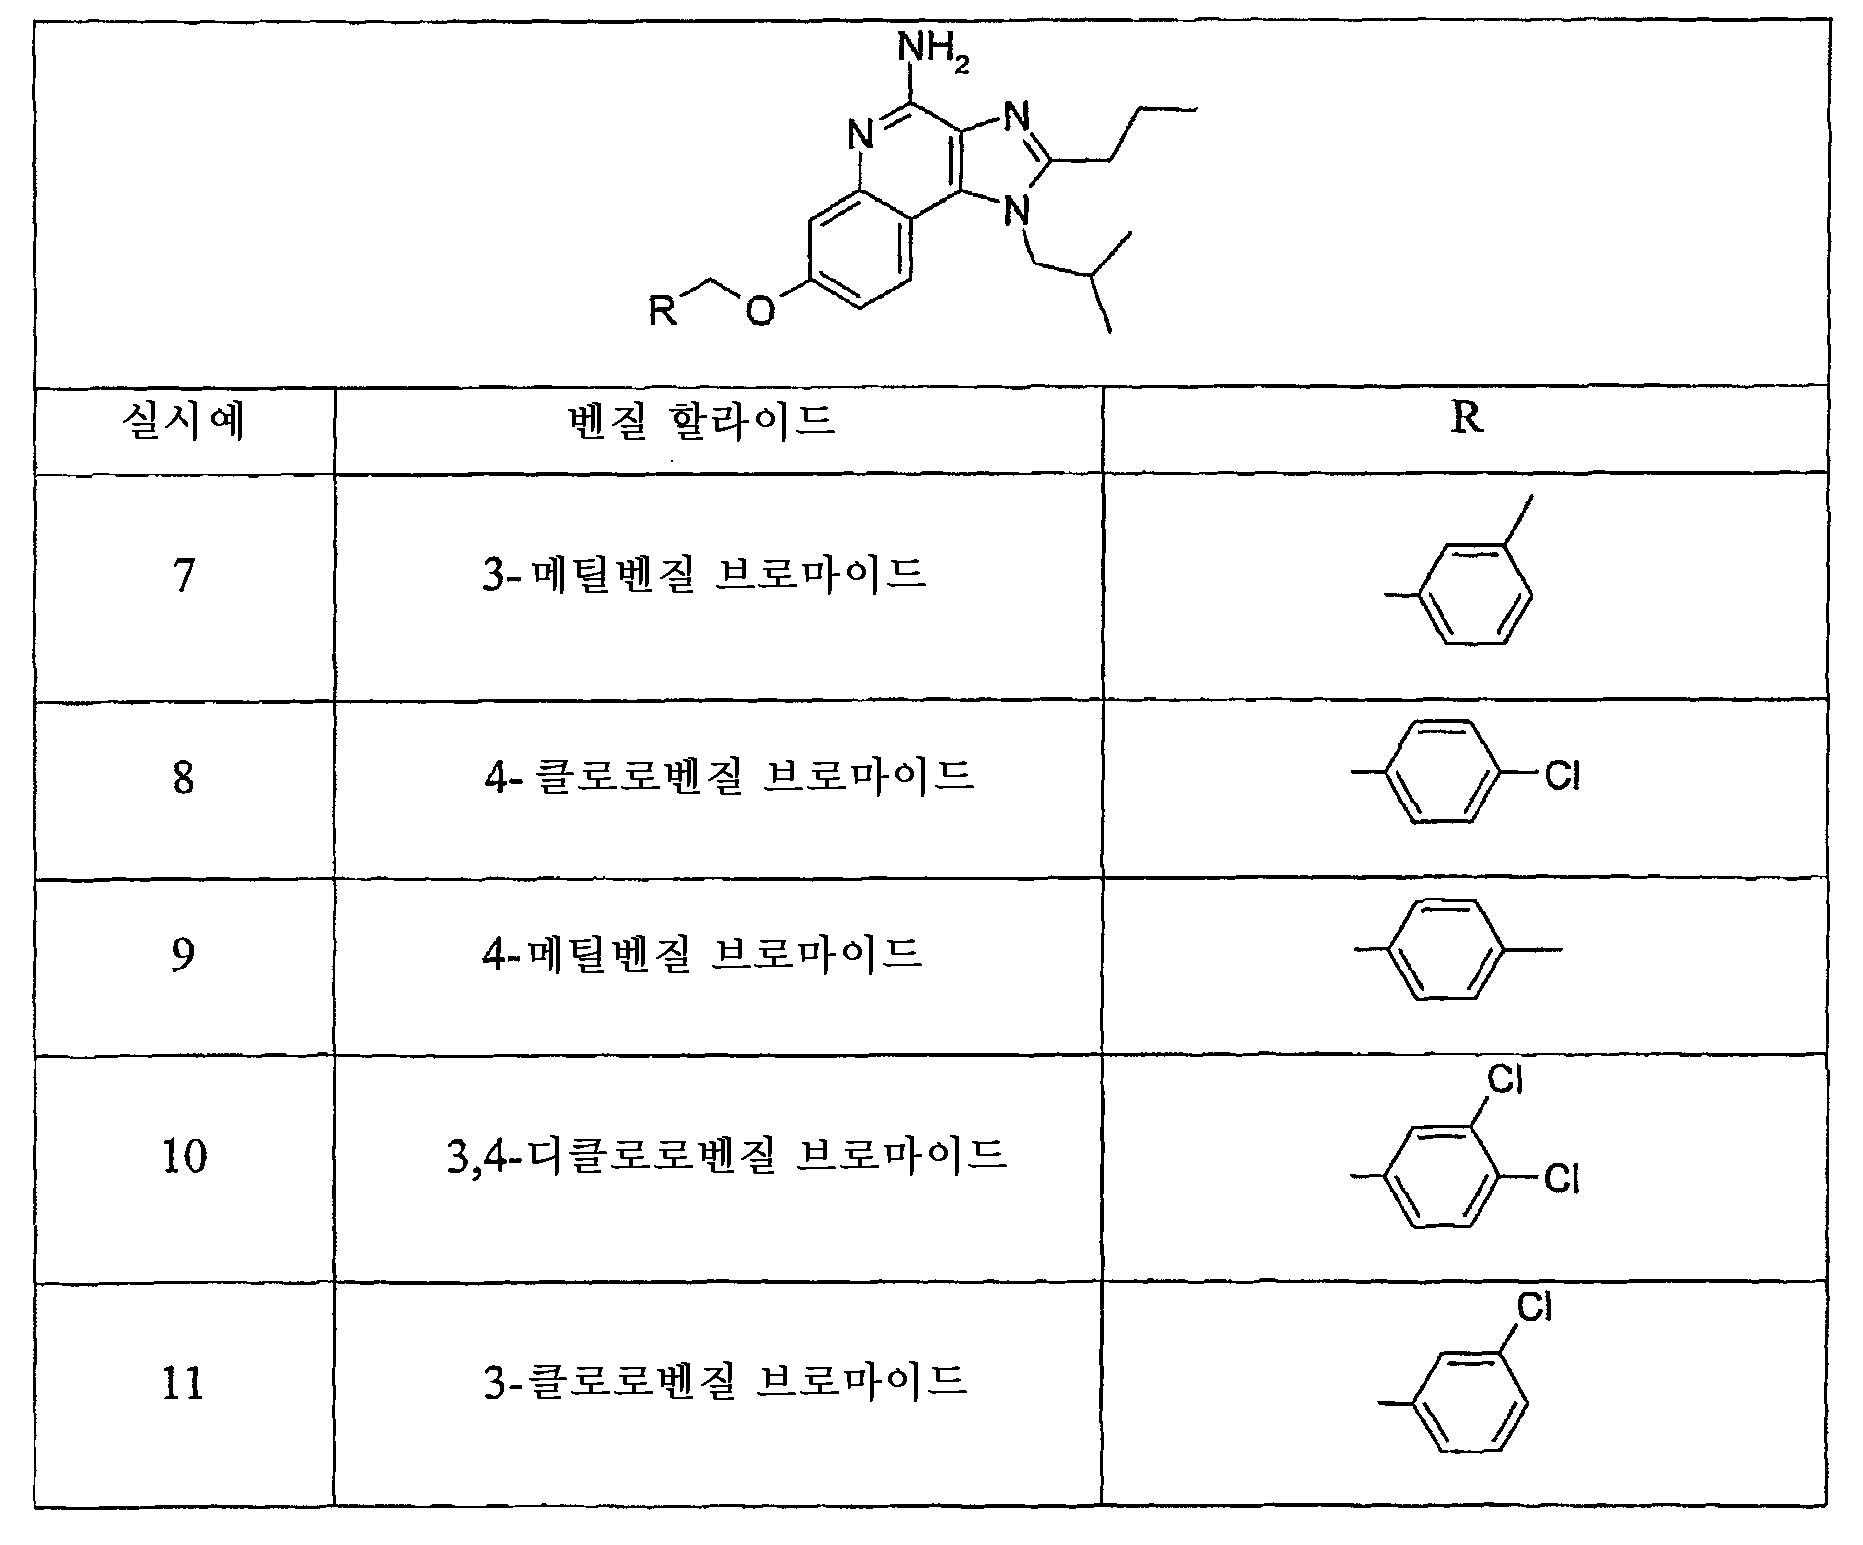 Figure 112006013759285-pct00121